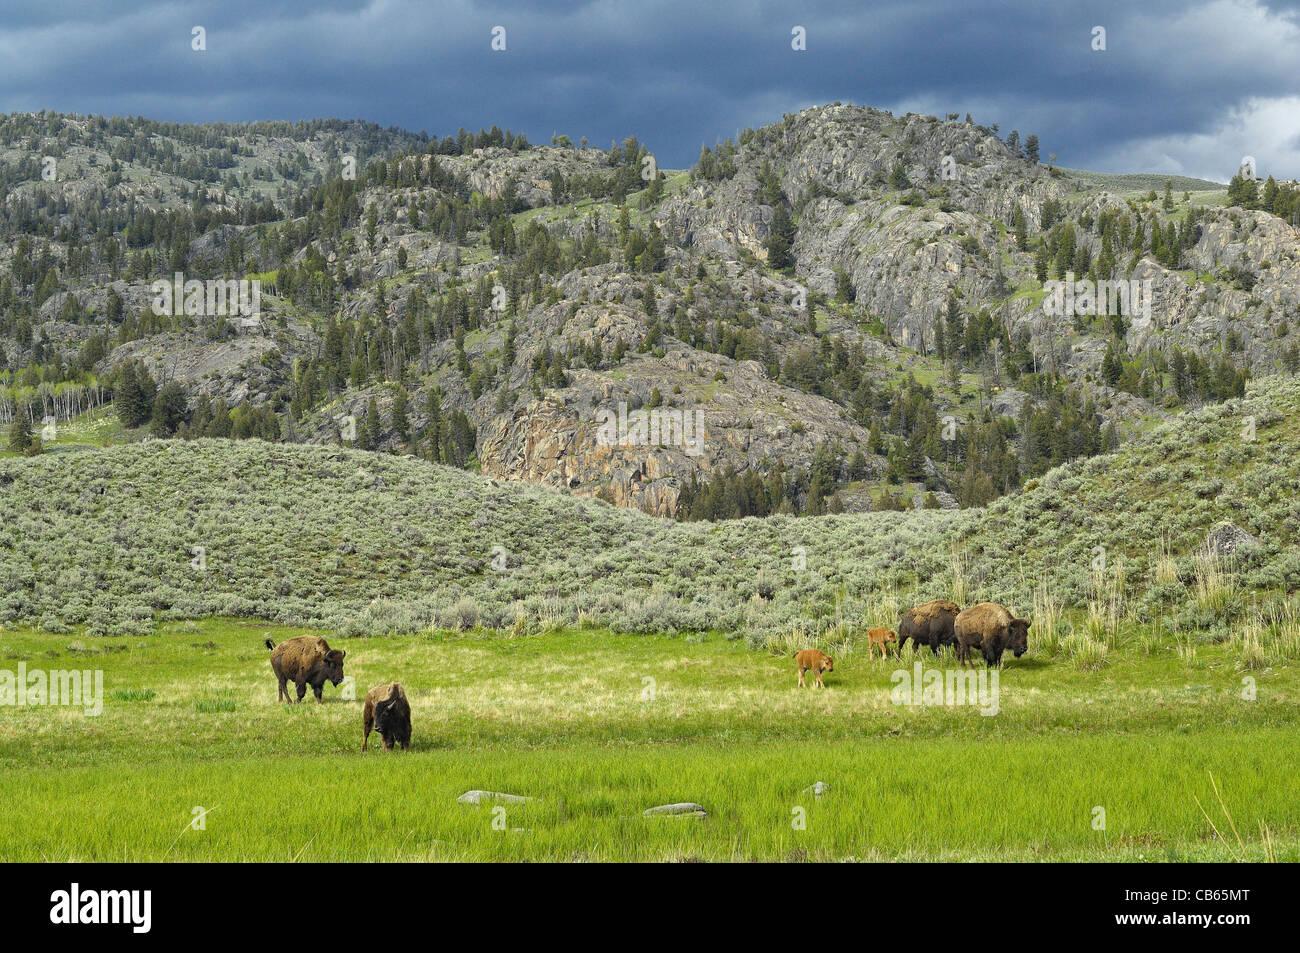 American Buffalo mothers and babies traveling the beautiful Yellowstone wilderness. - Stock Image